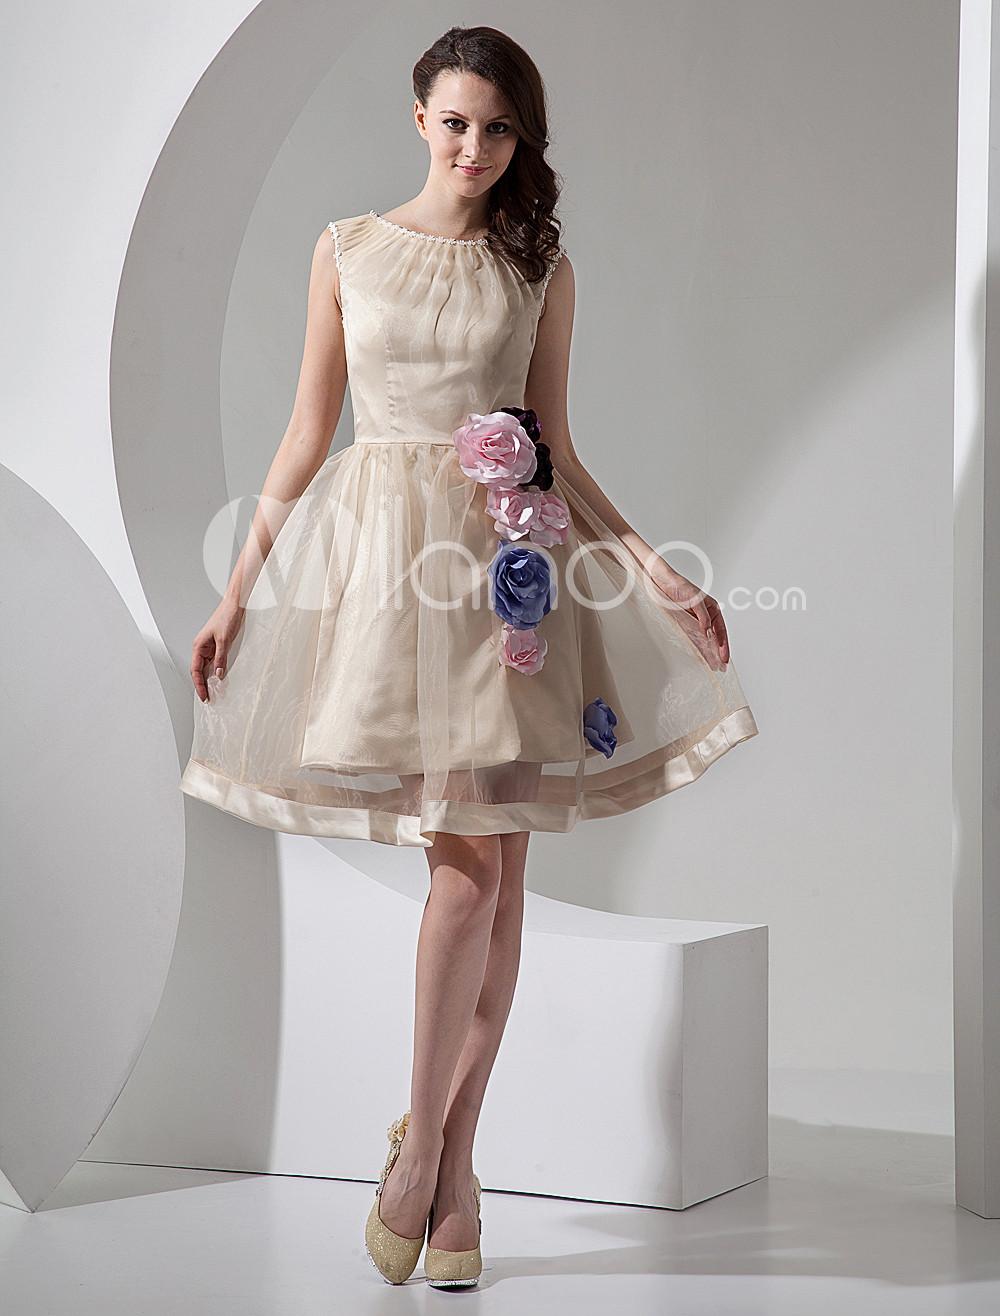 Short Mini Wedding Dresses The Fashionbrides